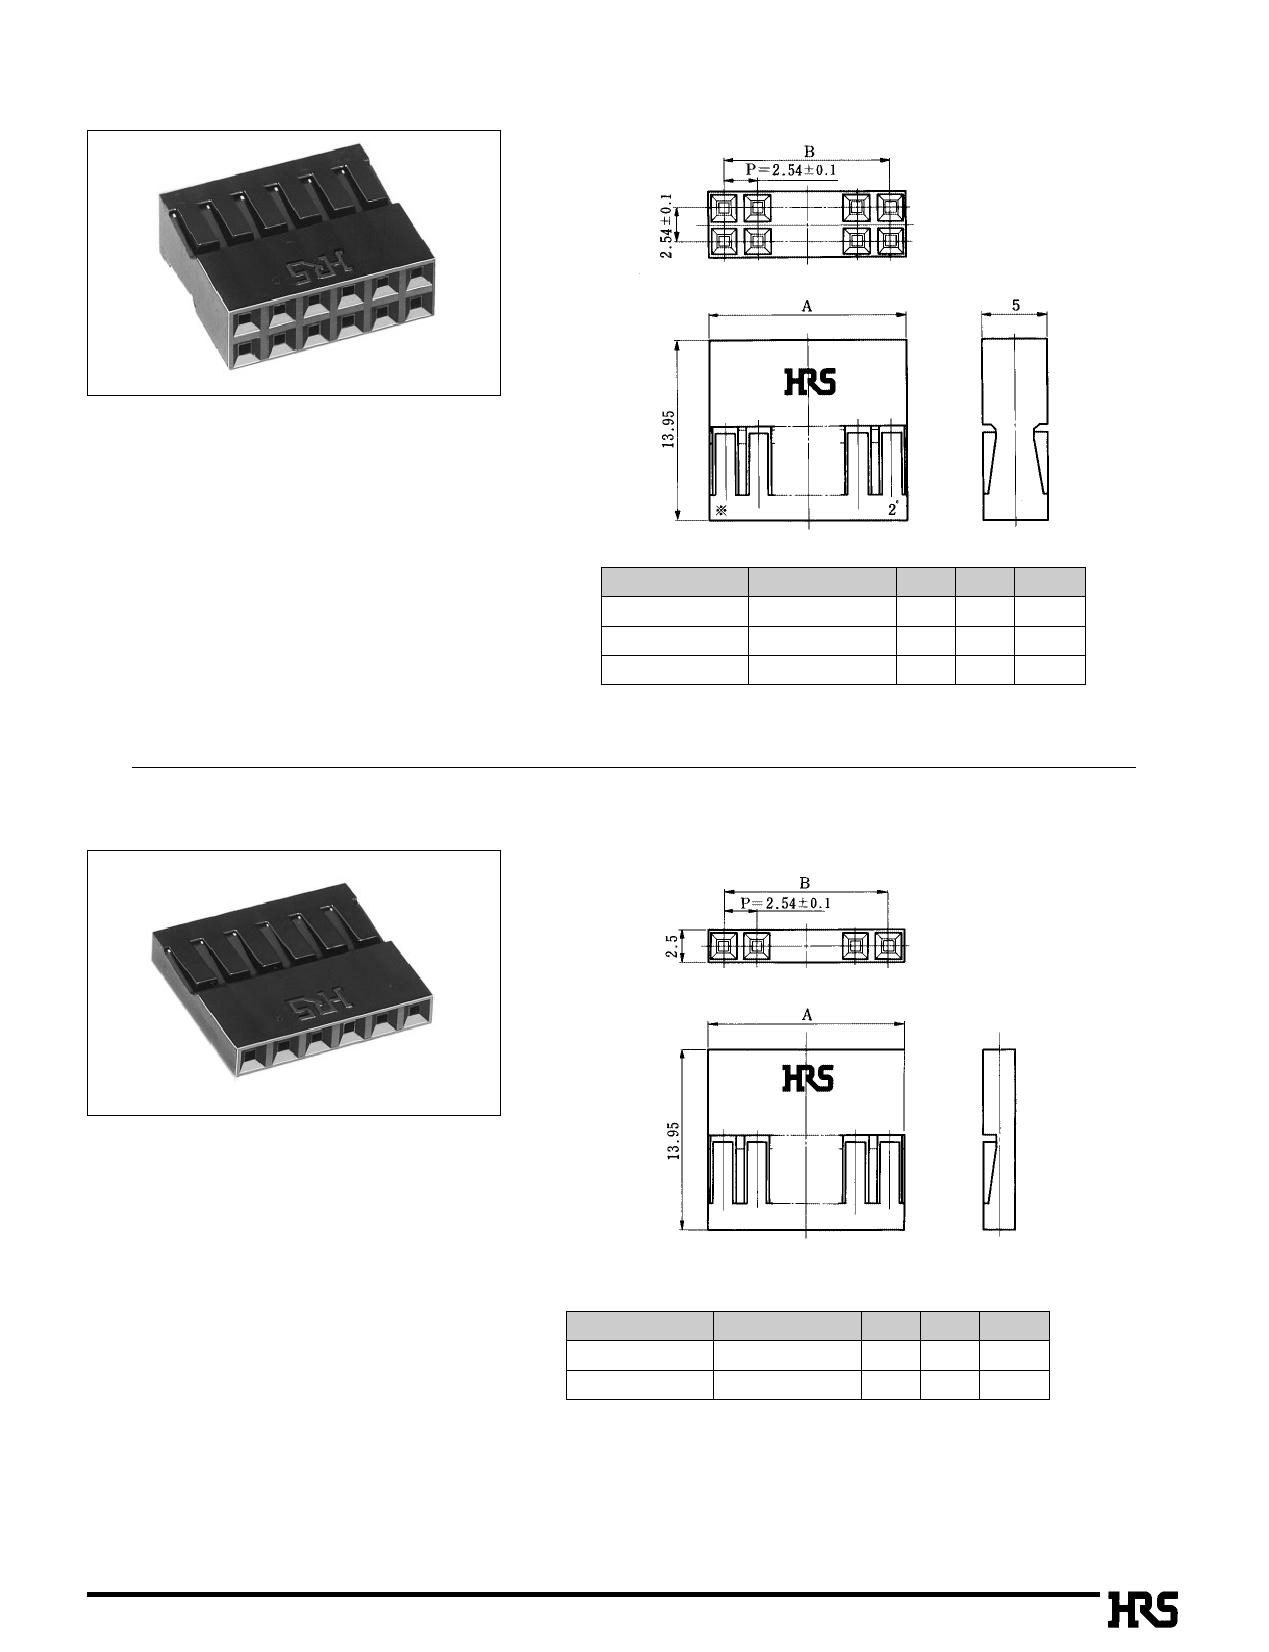 A1-06PA-2.54DS 電子部品, 半導体